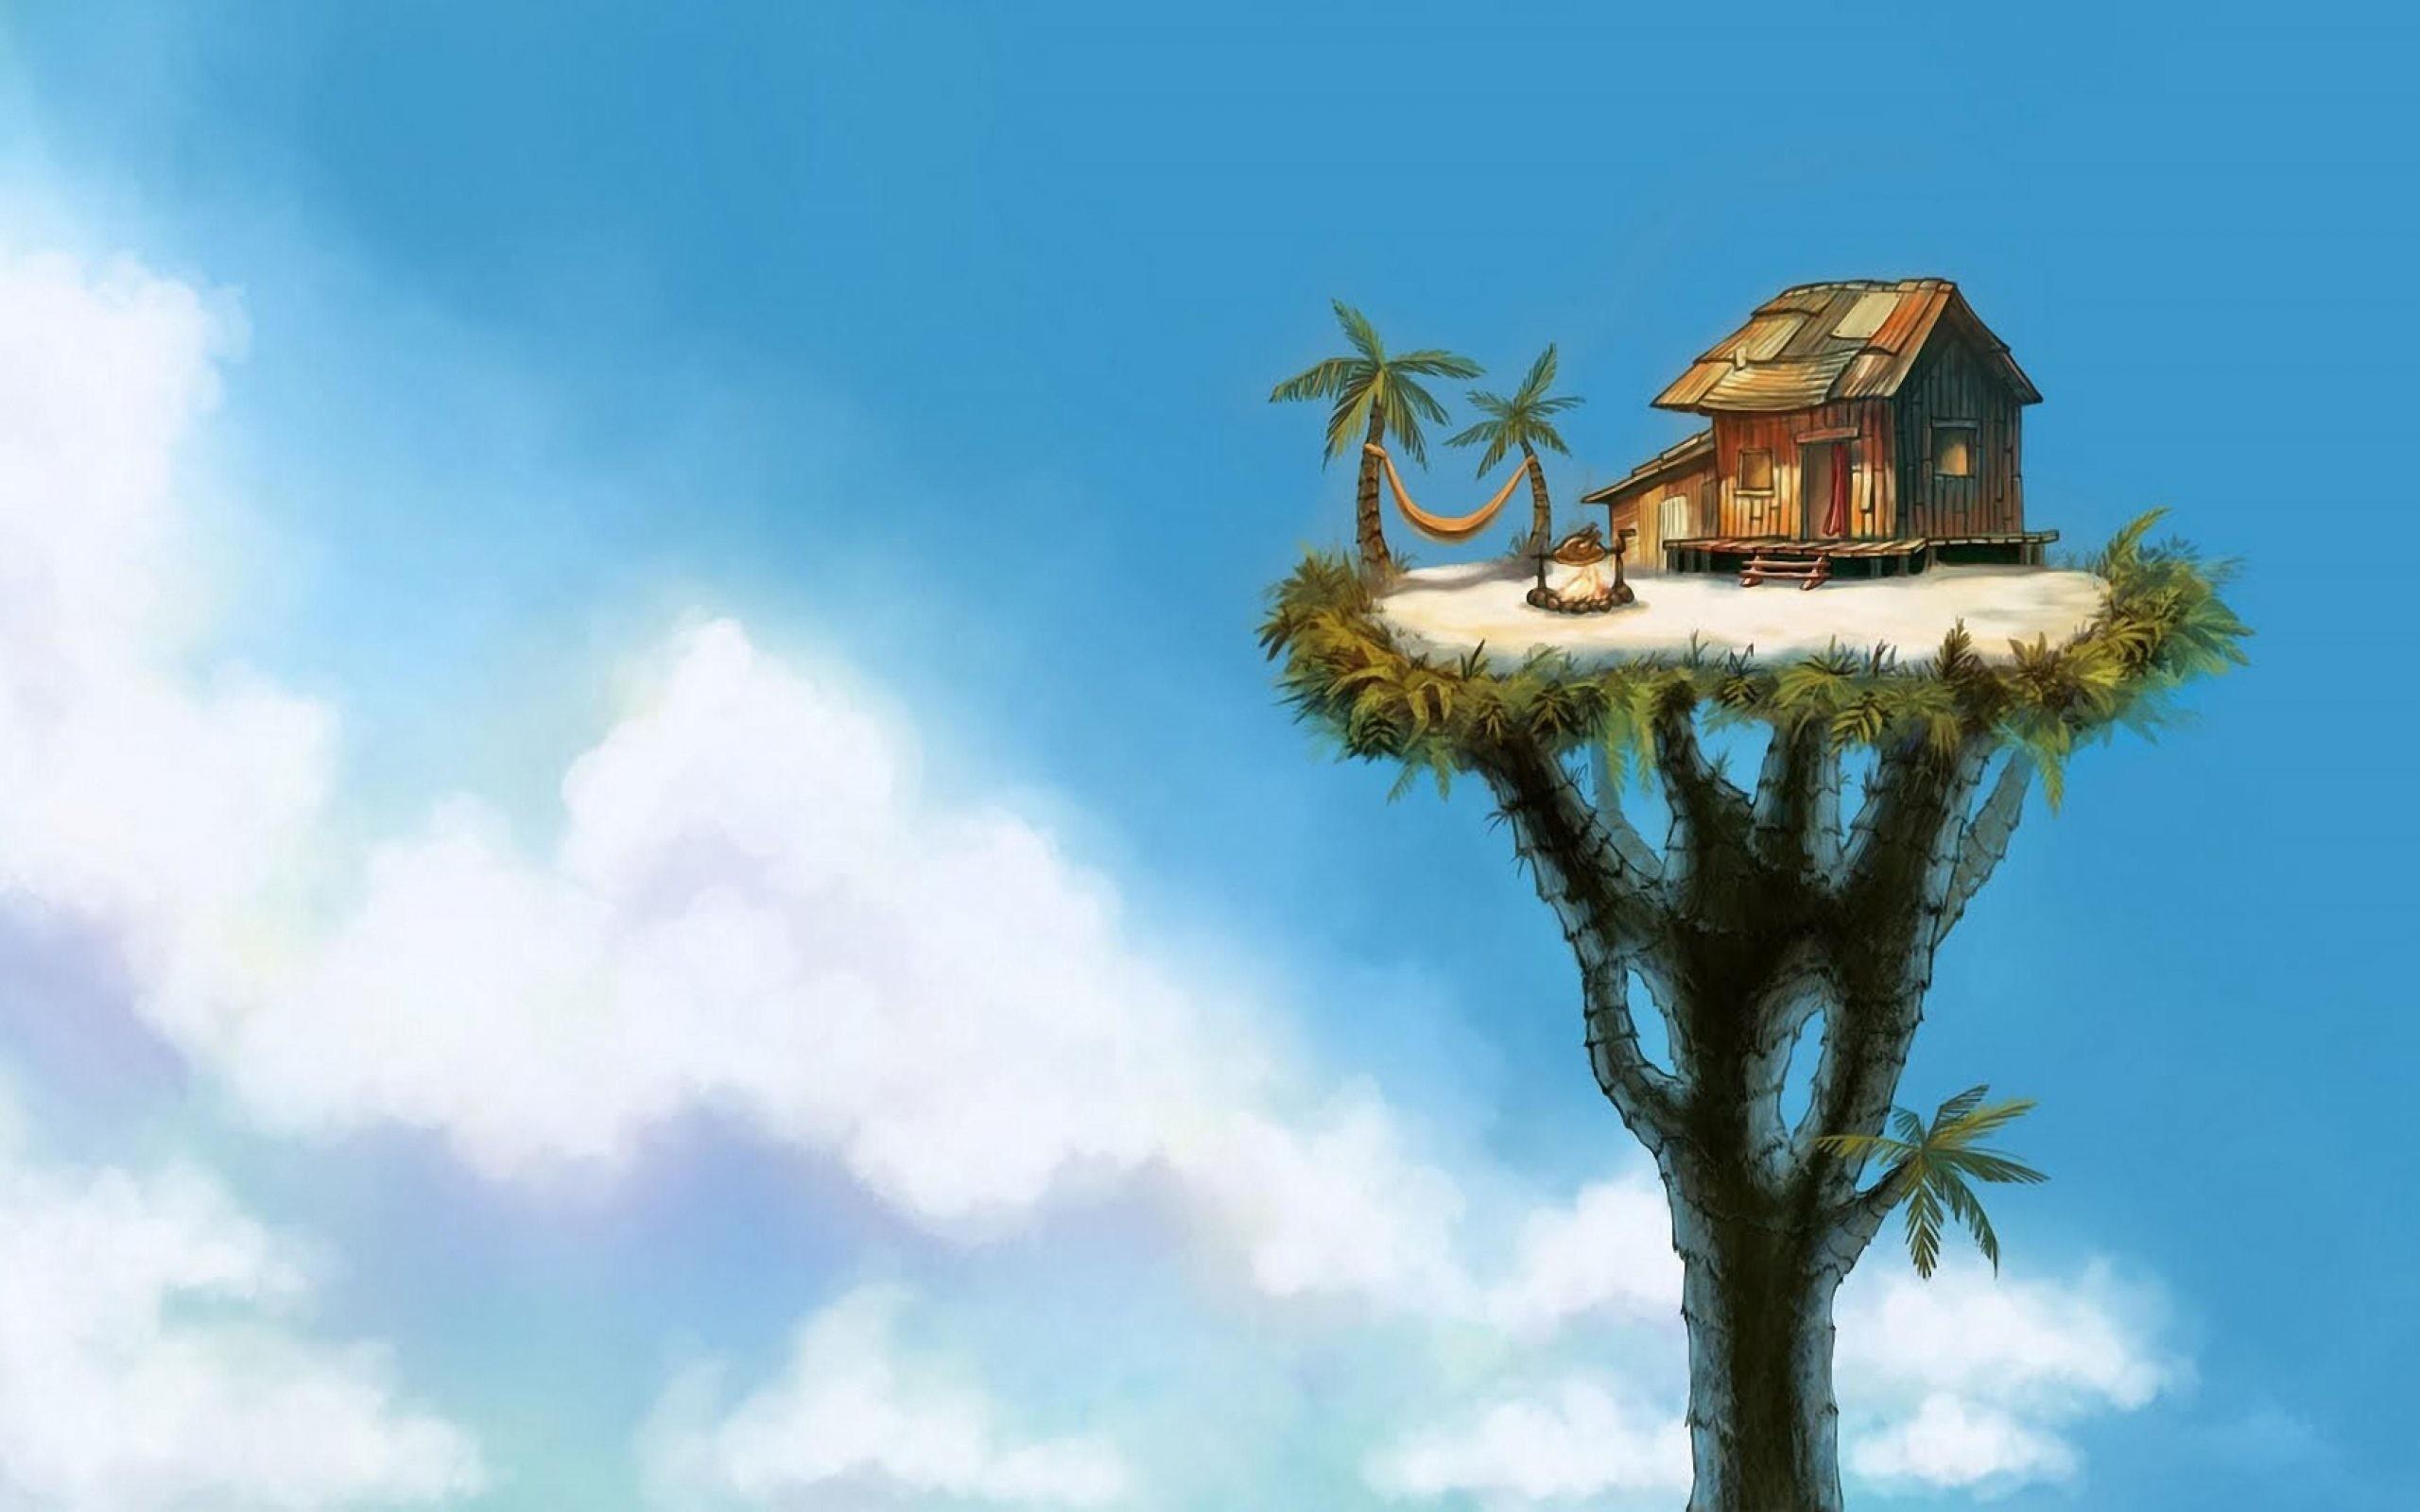 The Tree House Wallpaper For Desktop Of Cool Art 4k. small apartment living  room. …